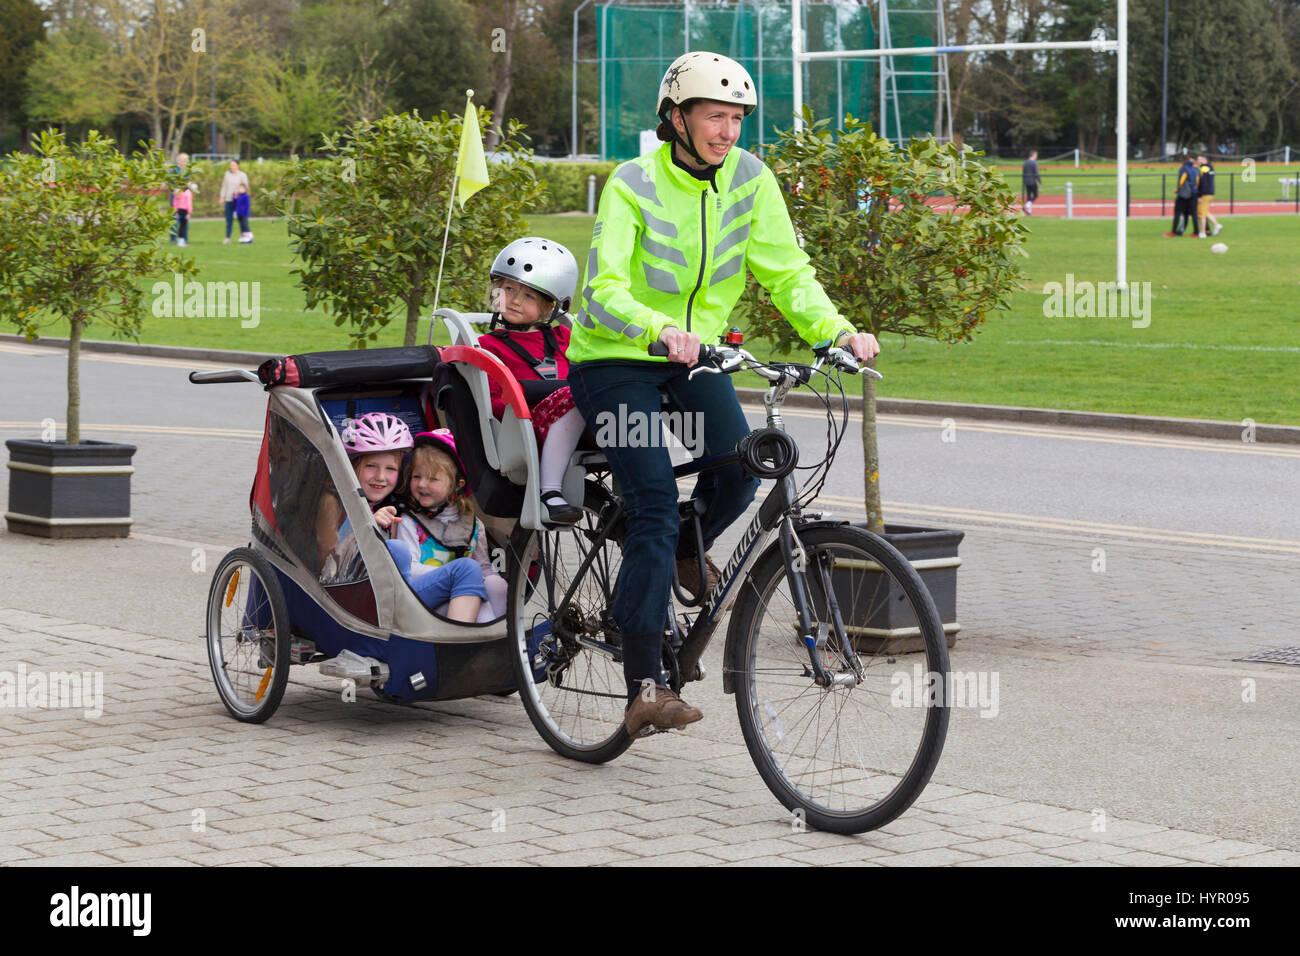 Baby In Bike Trailer Need A Helmet